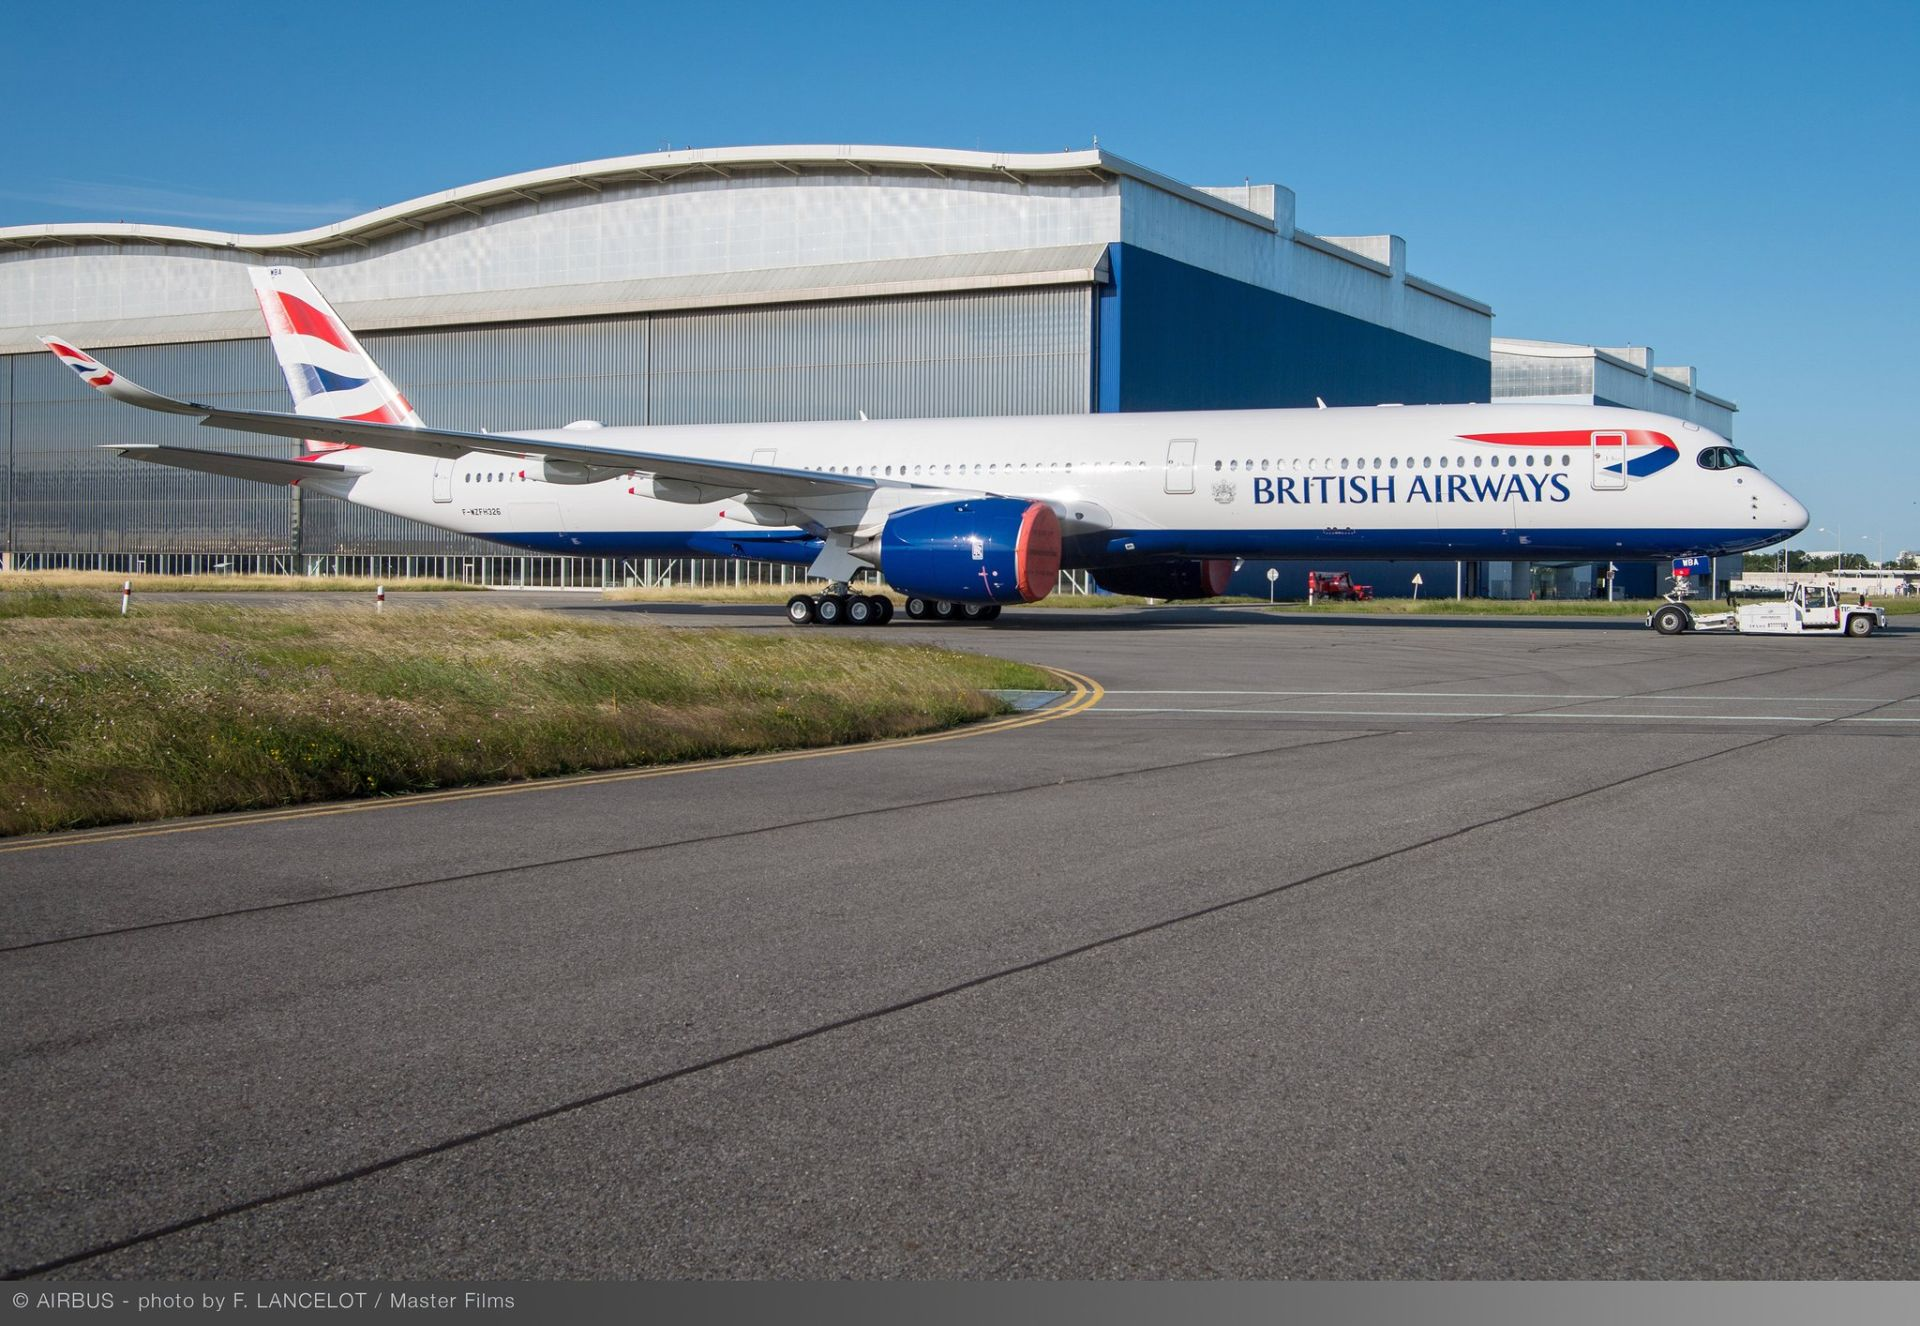 A350-1000 po výjezdu z lakovny v Toulouse v barvách British Airways. Foto: Airbus